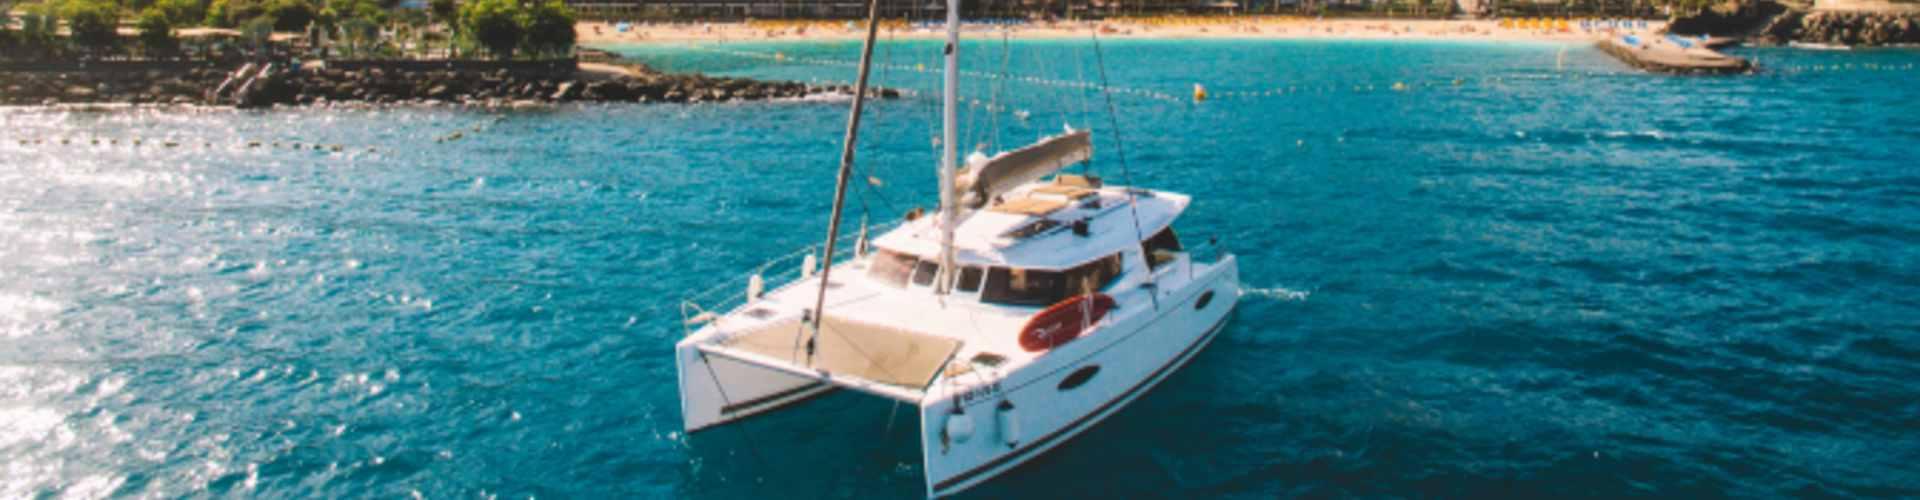 VIP Catamaran Boat Trip